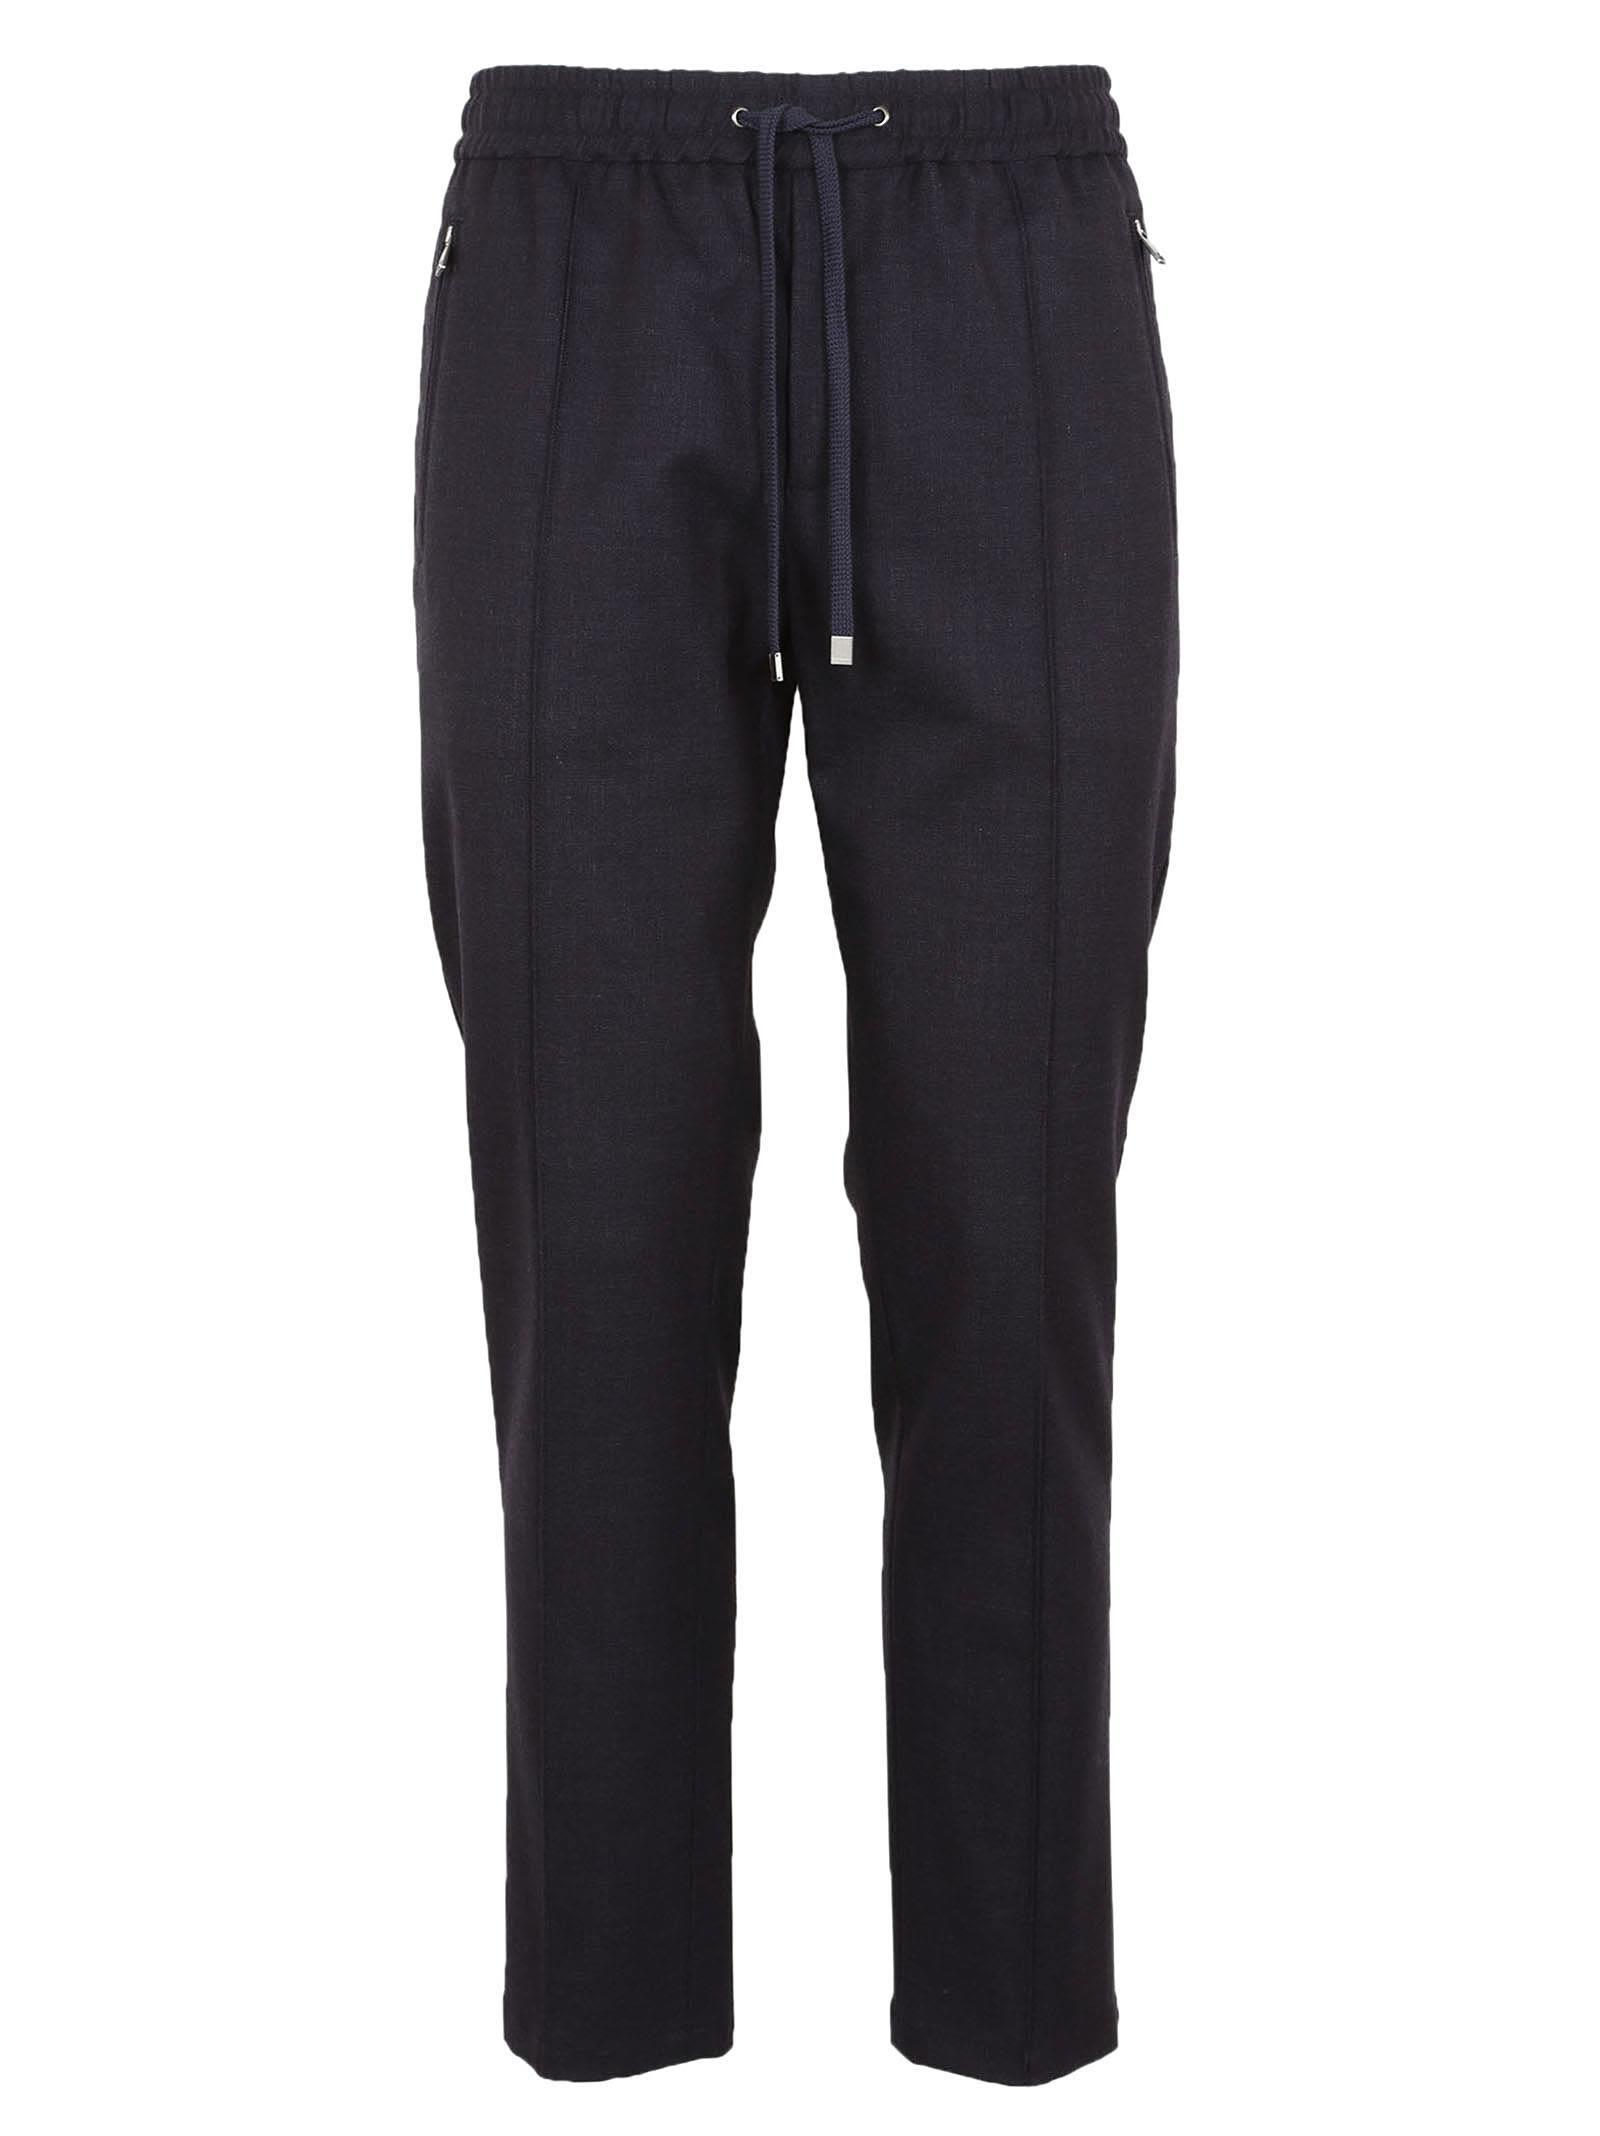 Dolce & Gabbana Tailored Track Pants